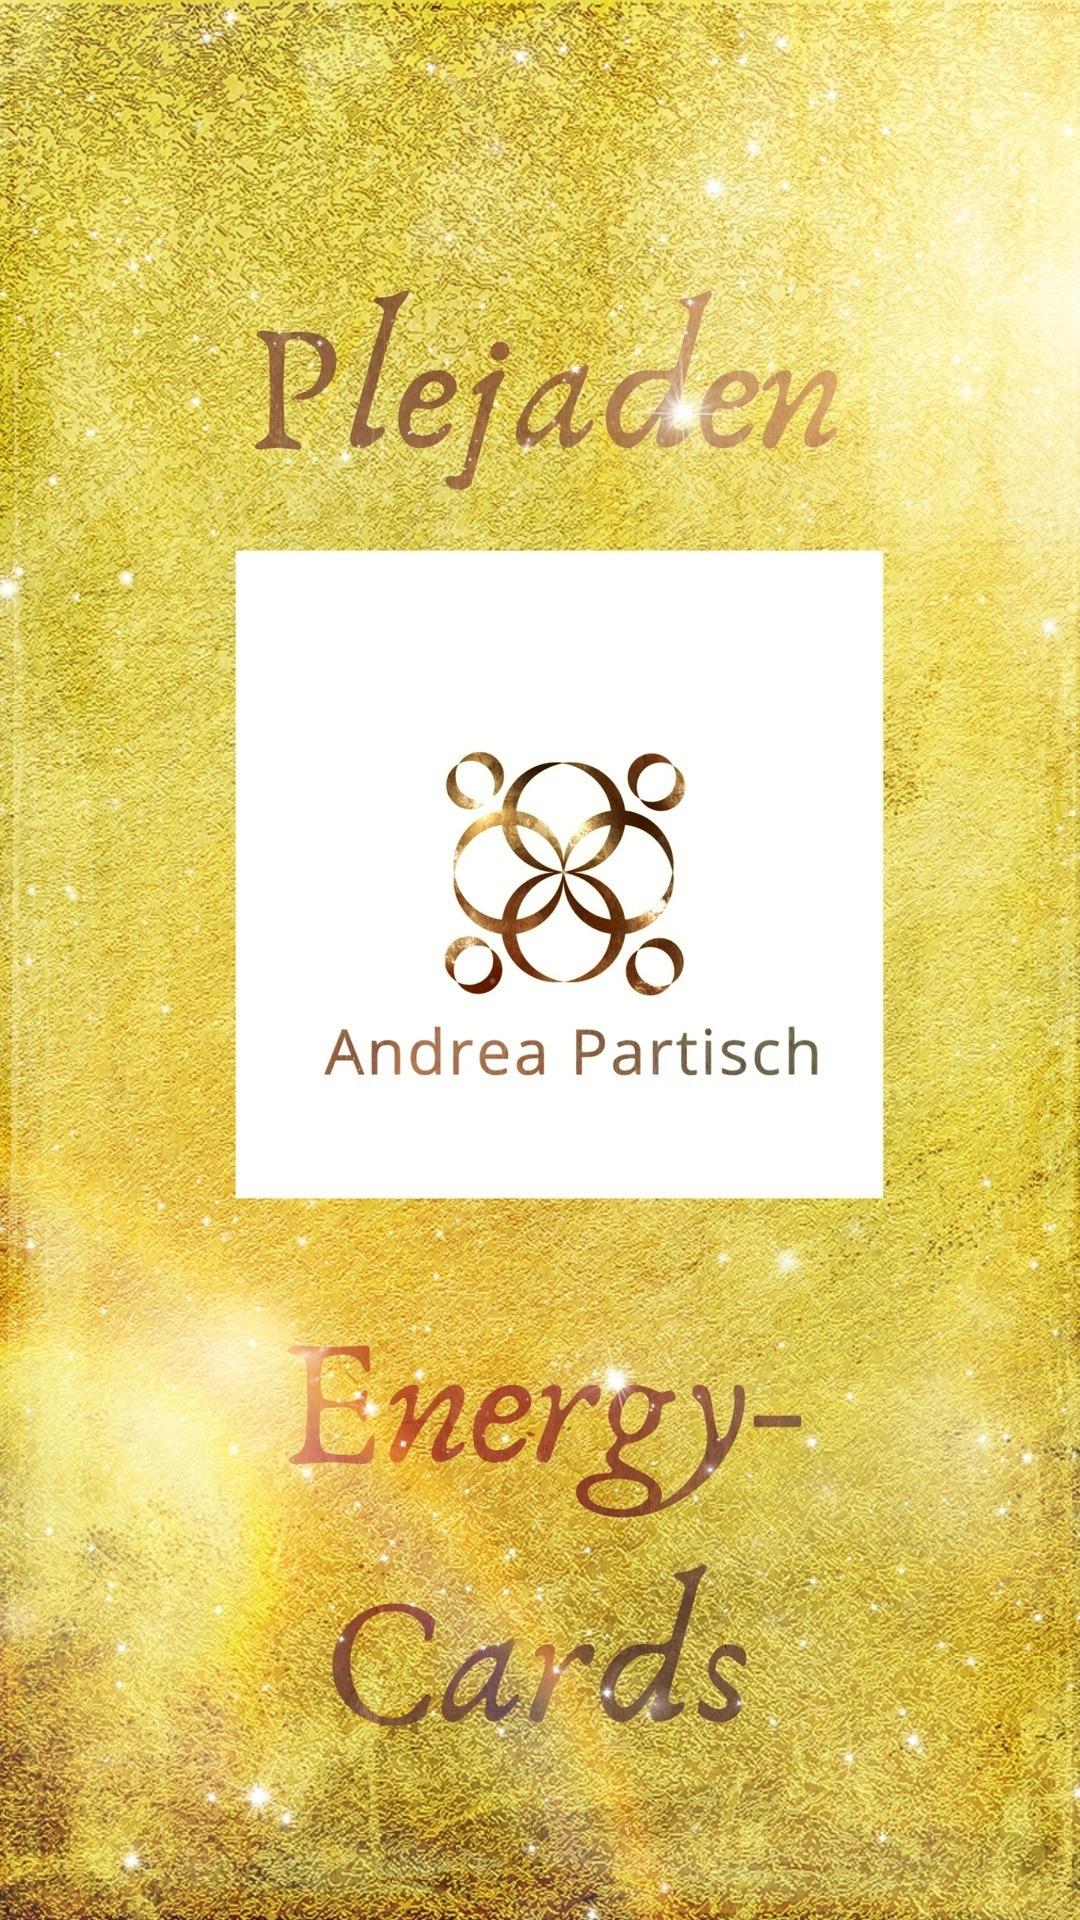 Plejaden Energy-Cards ®